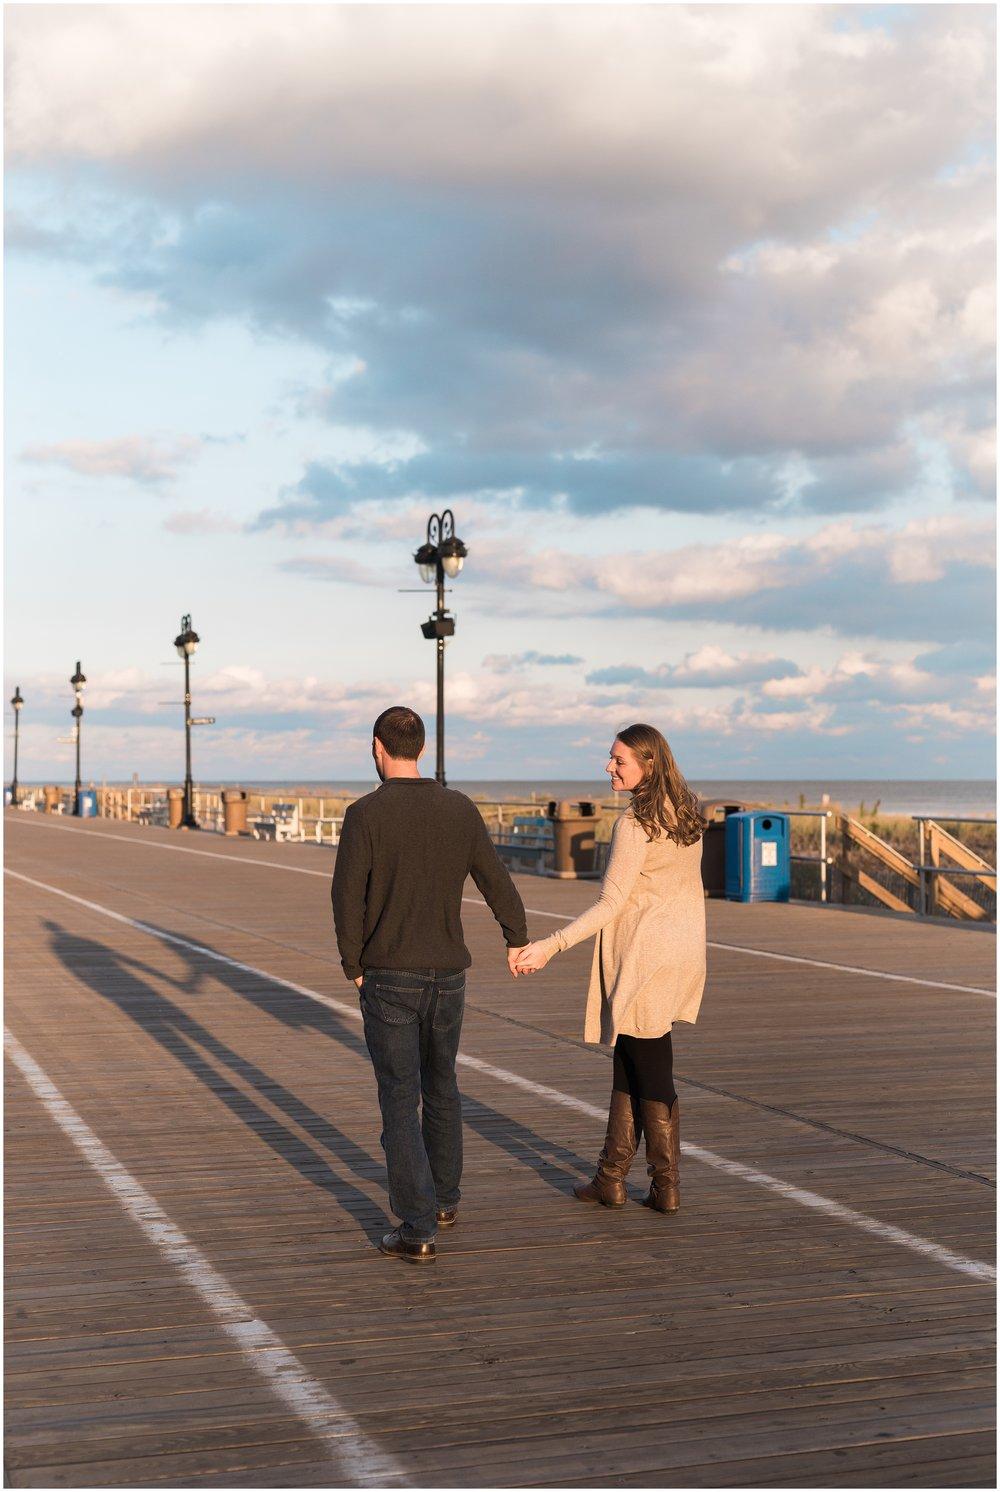 NJ-Ocean-City-Beach-Boardwalk-Engagement-Session-Photo_0029.jpg